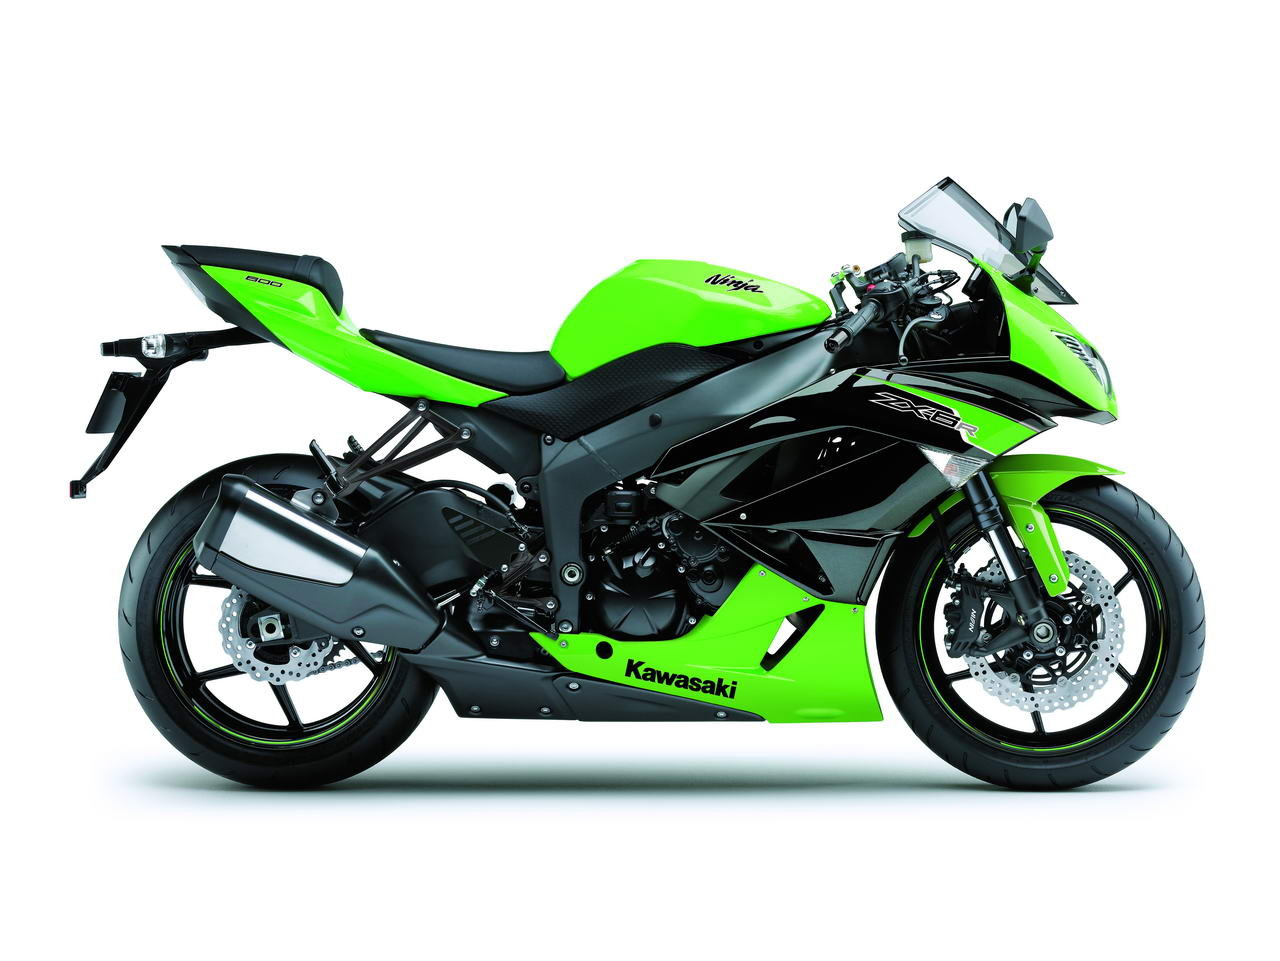 Listino Kawasaki VN 900 Classic Special Custom e Cruiser - image 15521_kawasaki-ninjazx-6r on http://moto.motori.net